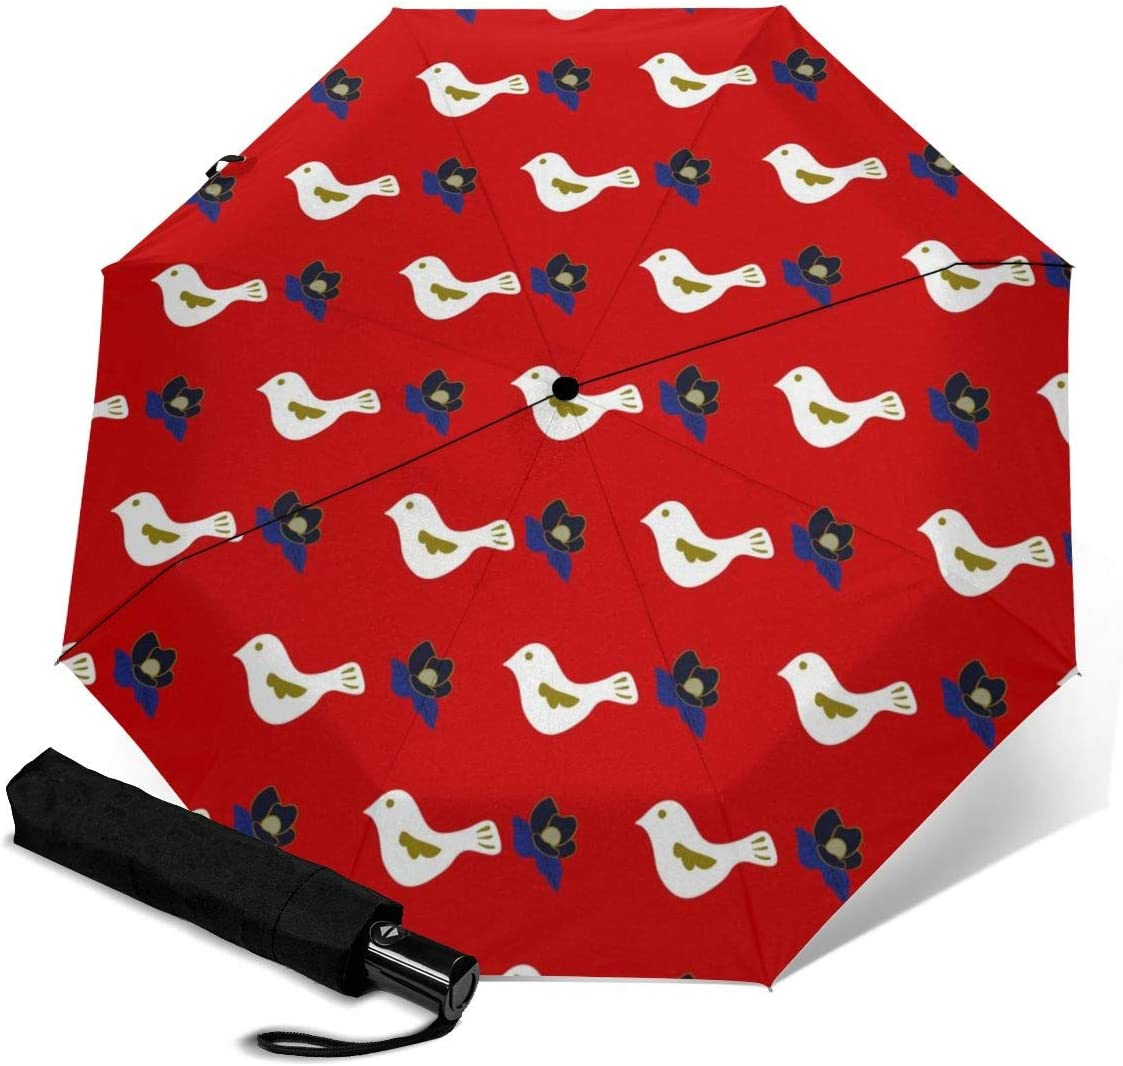 Doves And Magnolias Automatic Folding Umbrella Super Sunscreen Rain Portable Creative UV Protection Tri-Fold Umbrella